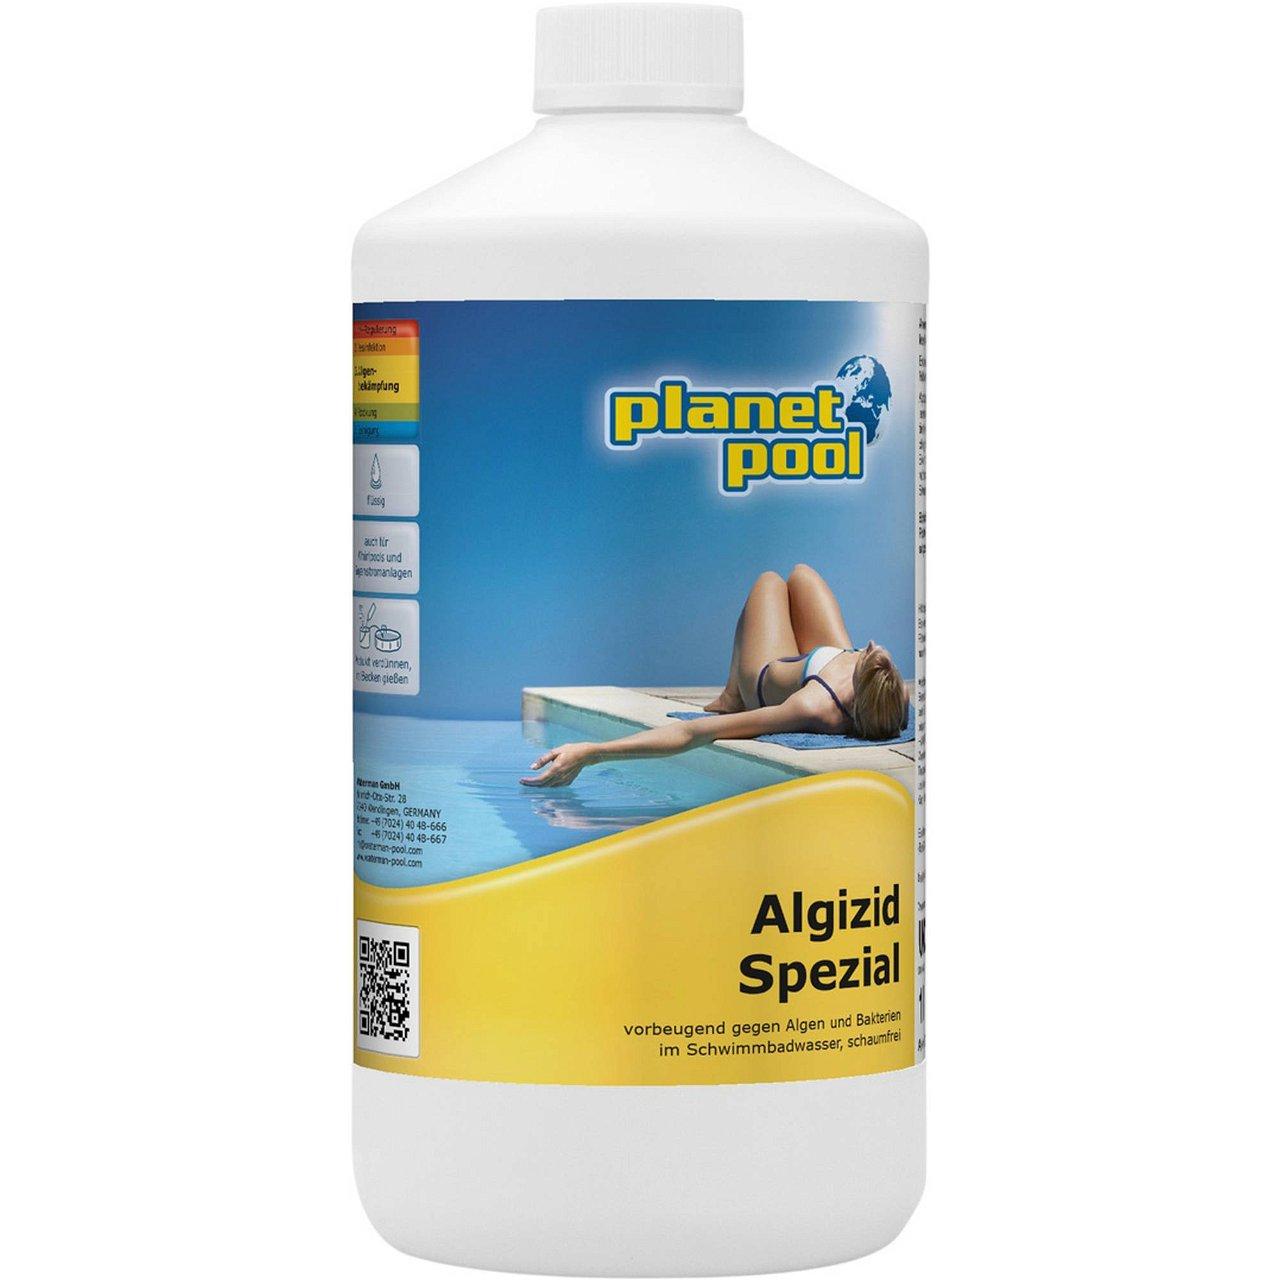 PLANET POOL Algizid Spezial 1 Liter